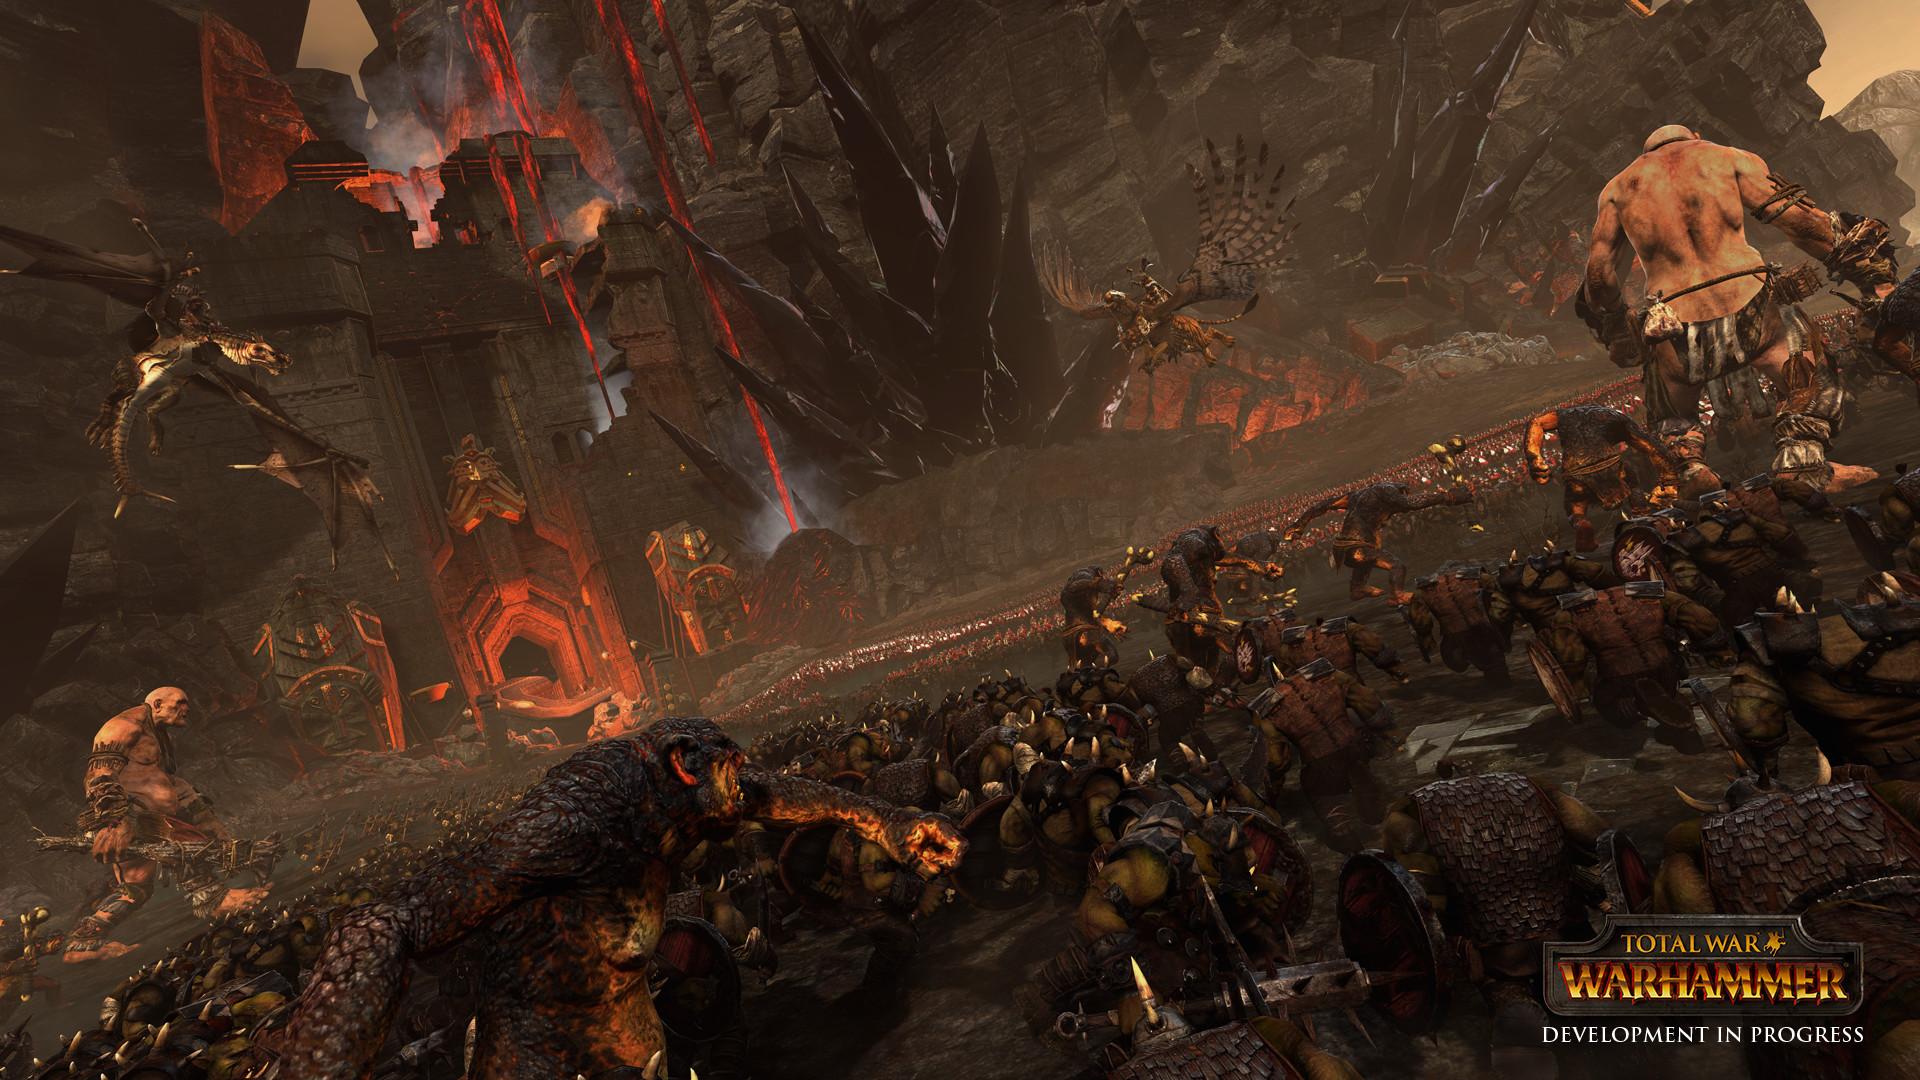 Total War: Warhammer Full HD Wallpaper 1920×1080